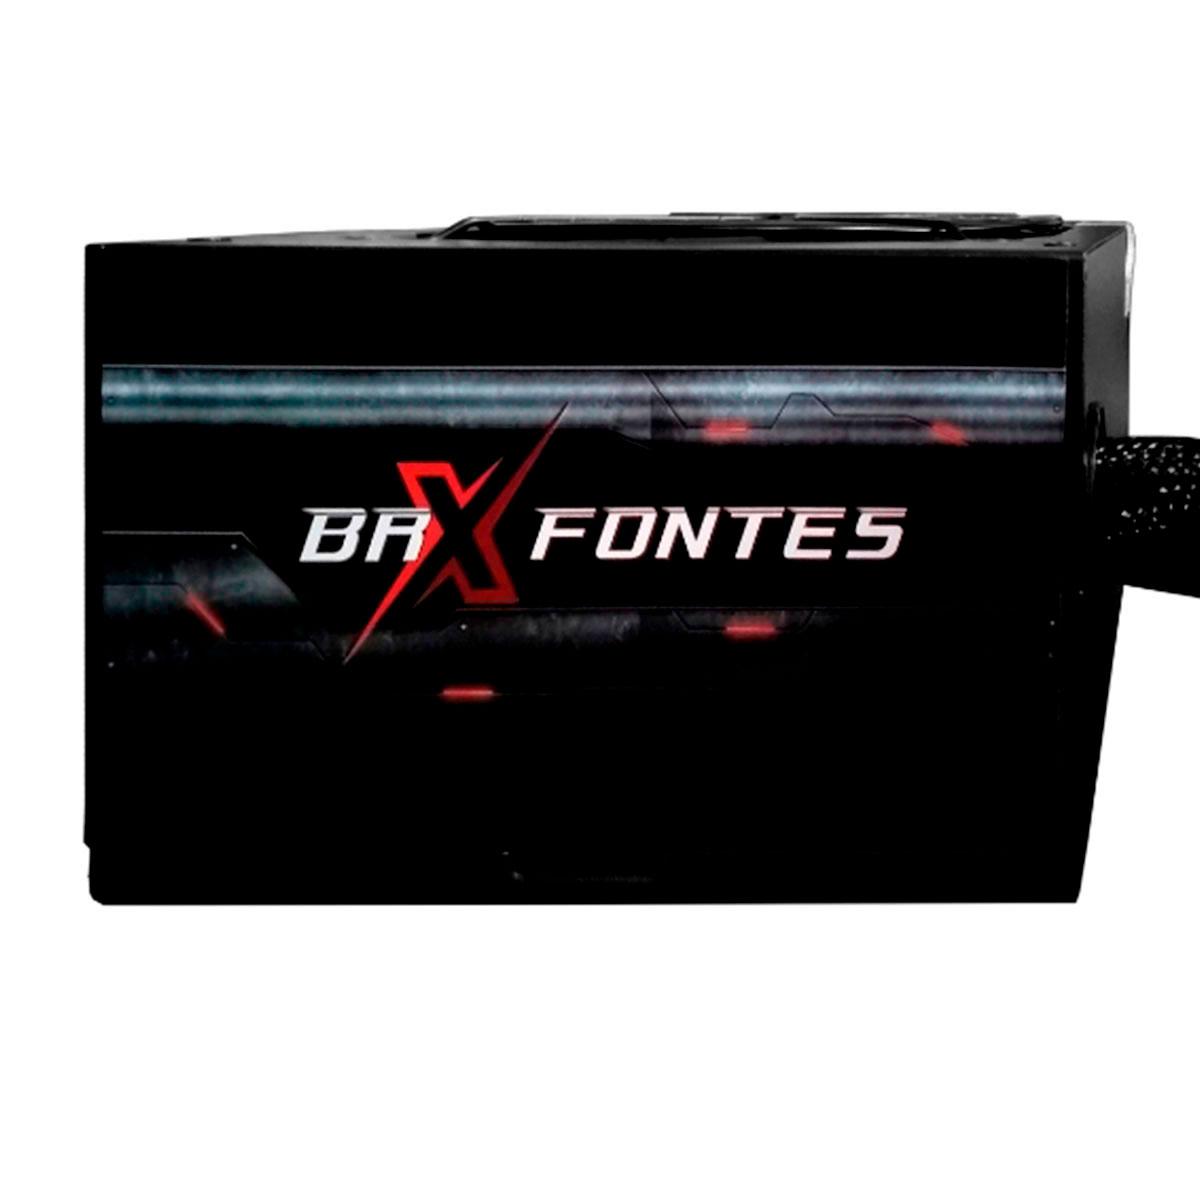 Fonte Gamer ATX BRX B-S750W, 750W Real, Cooler120mm, Bivolt Chaveada